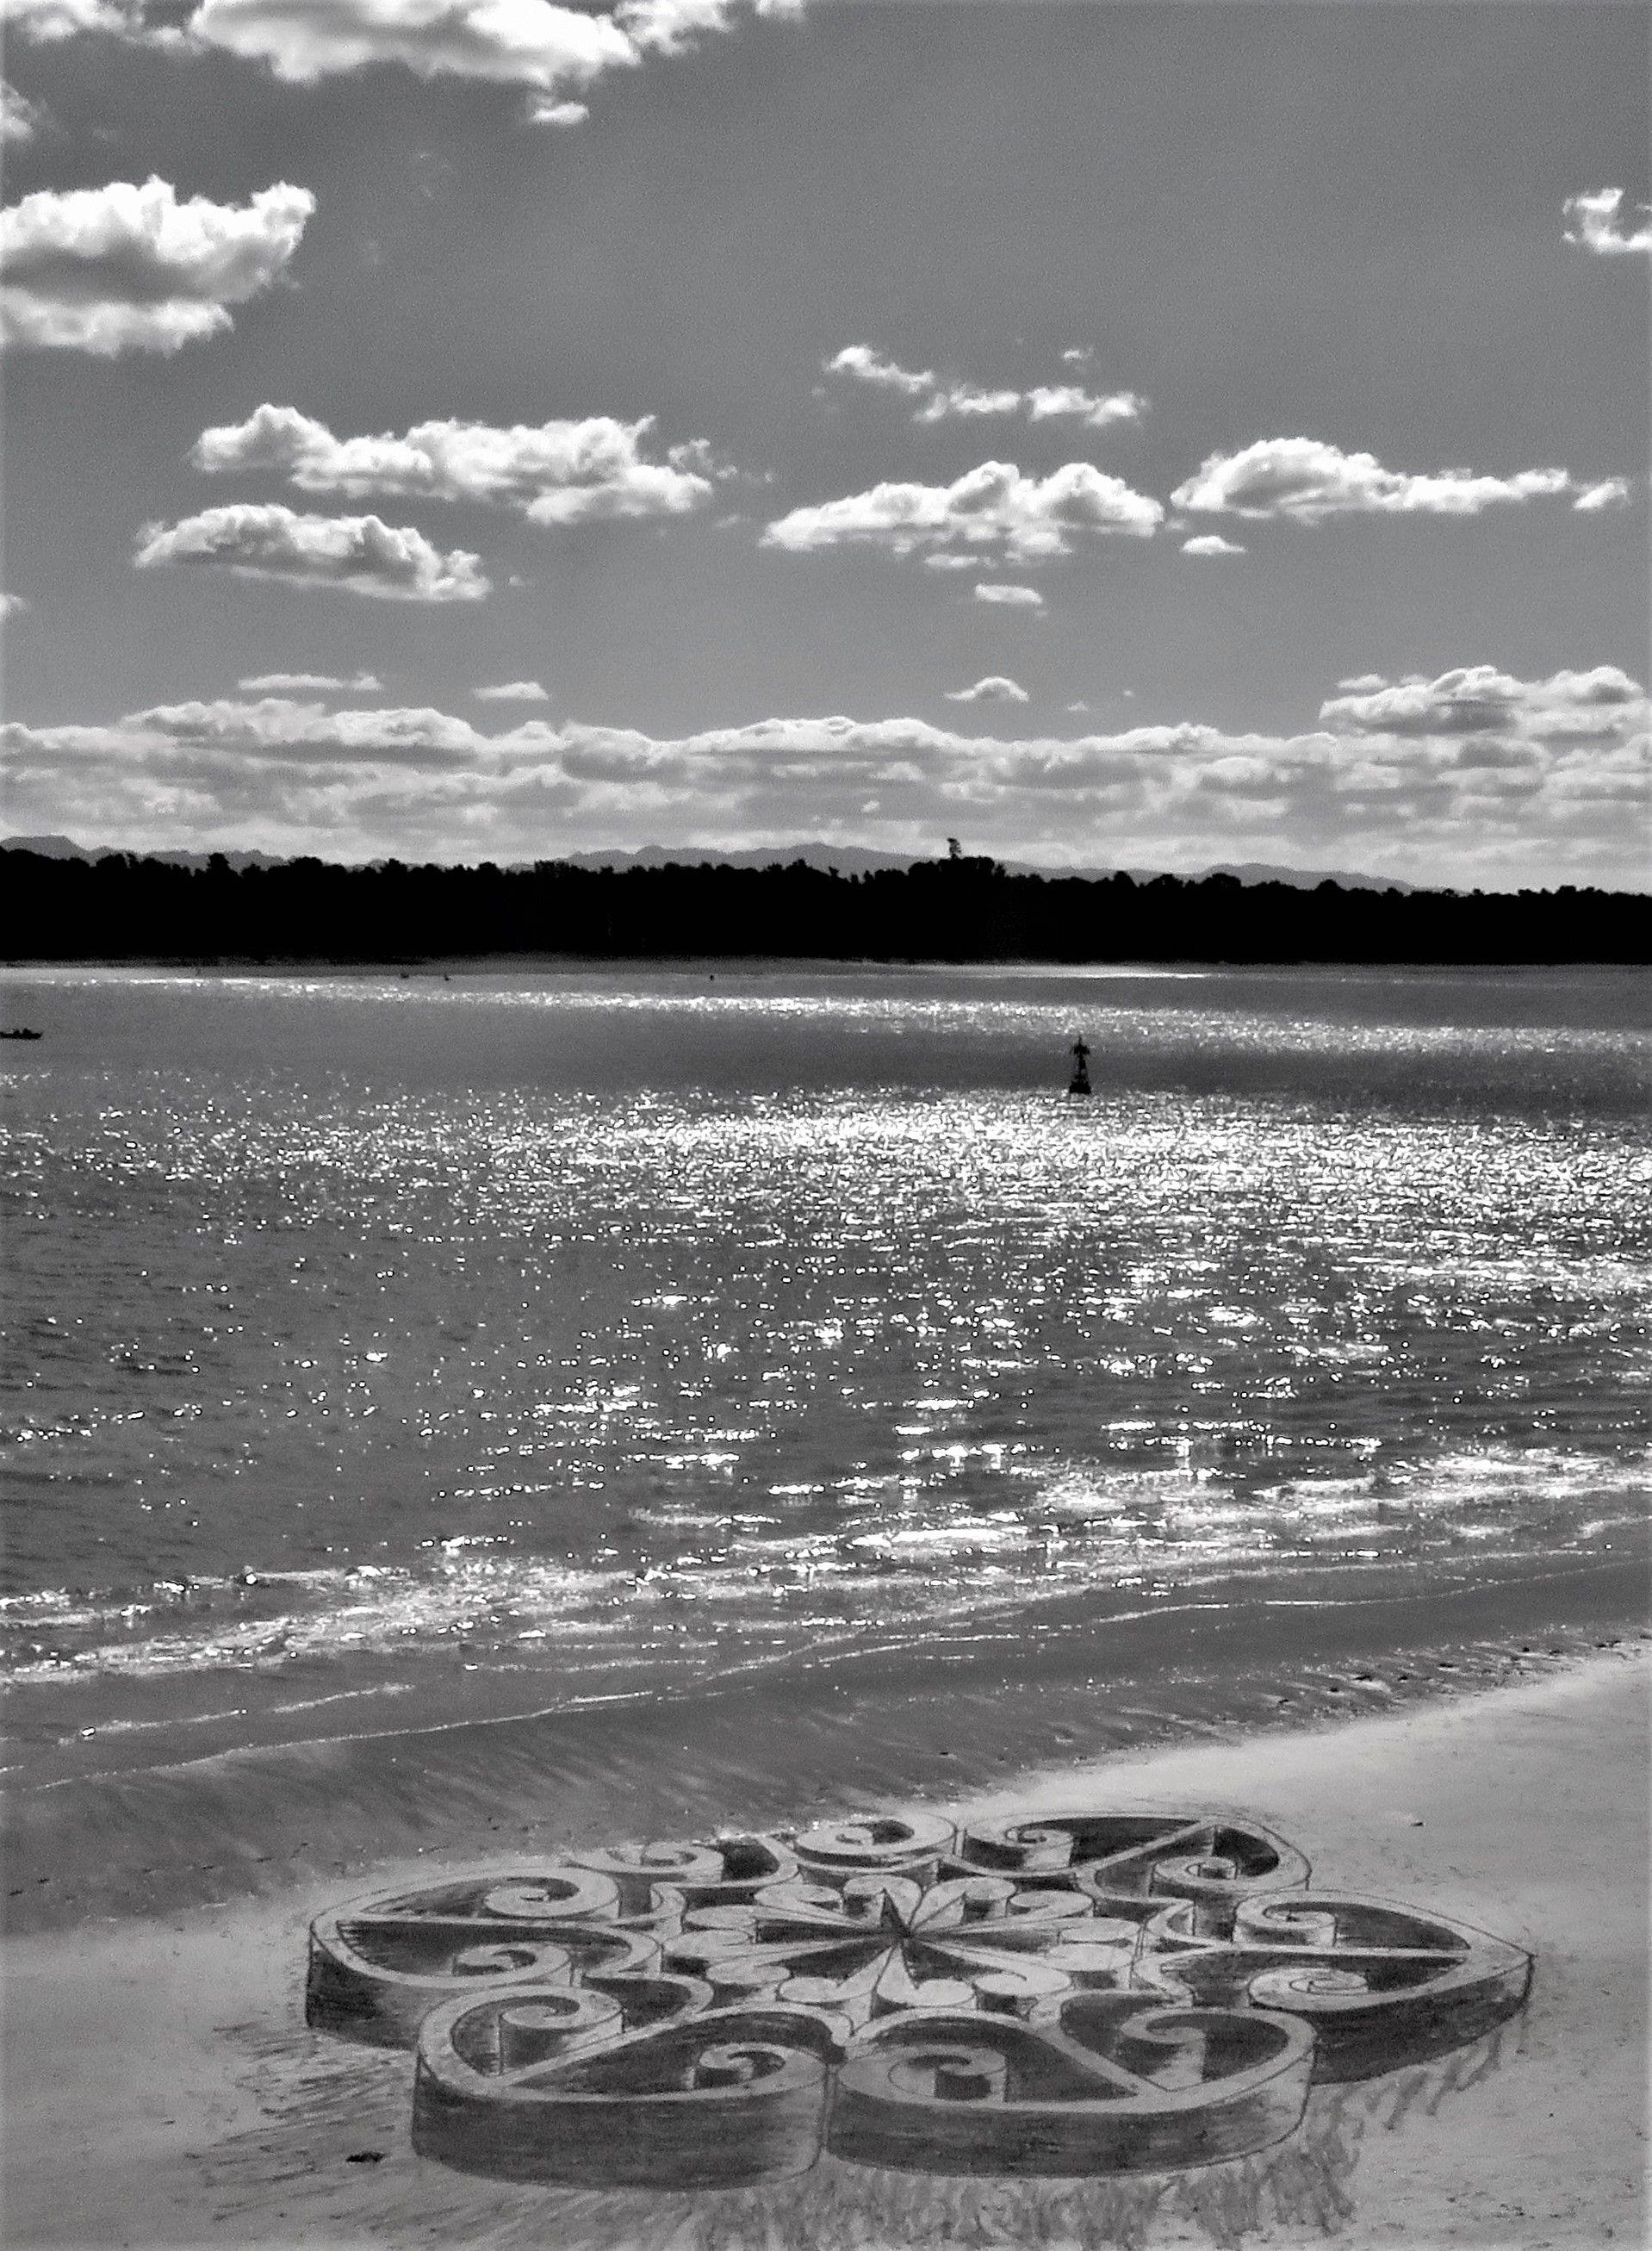 Image by A7med on Sand castle Sand castle